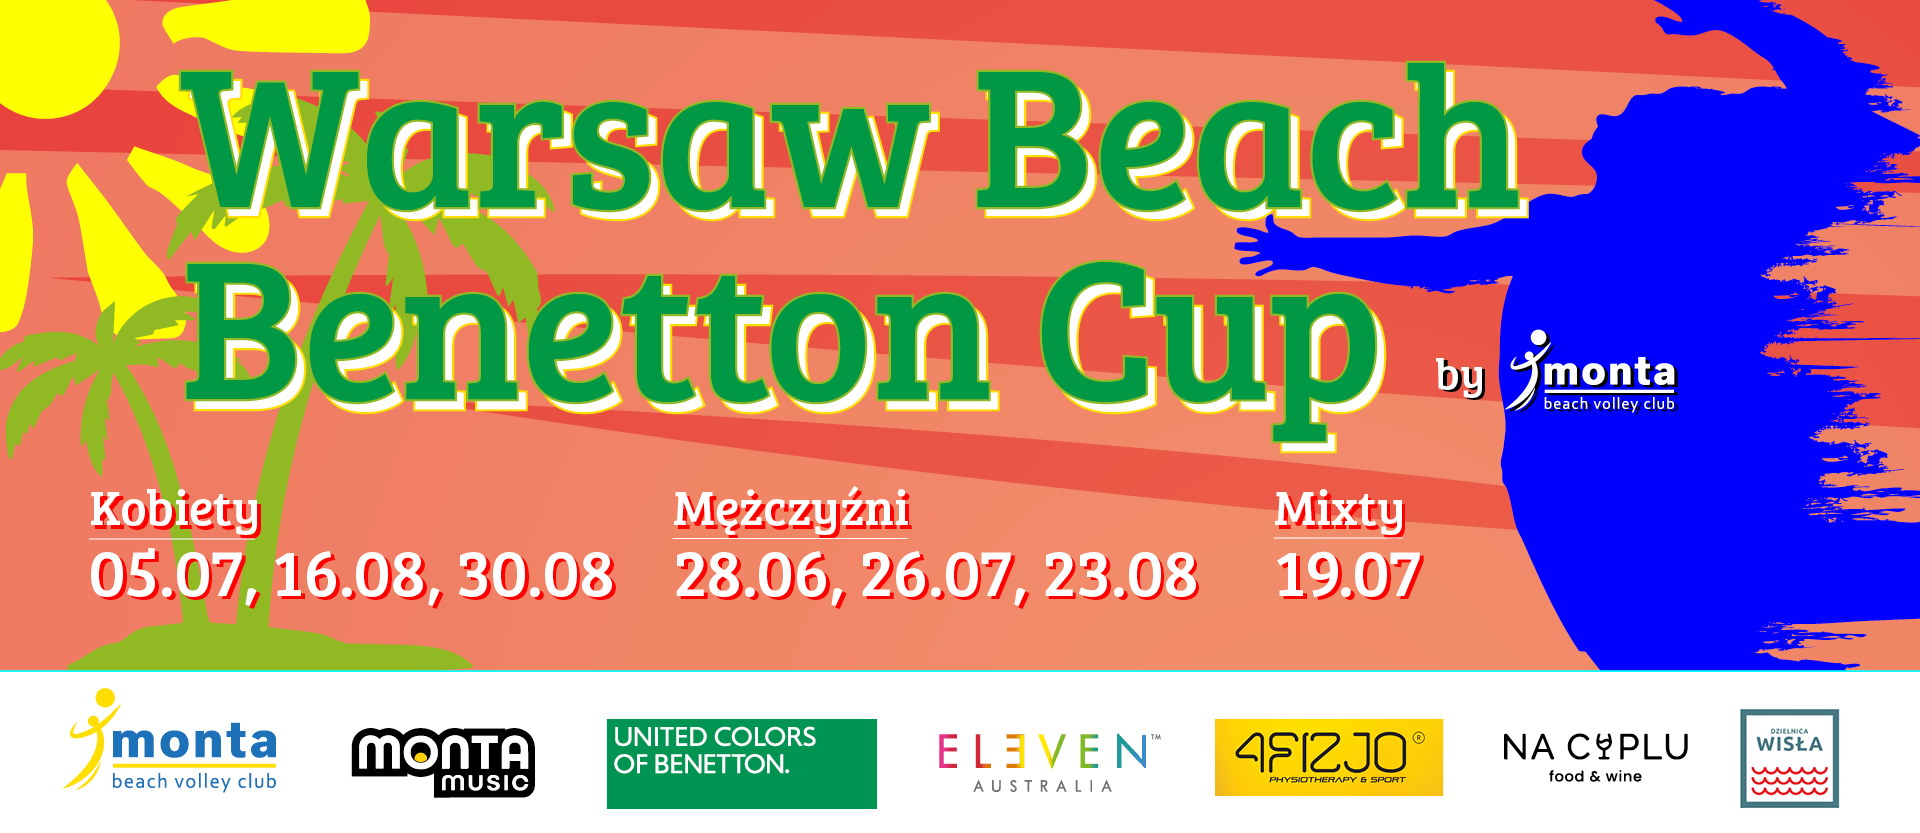 Warsaw_Beach_Benetton_Cup_Monta_Club